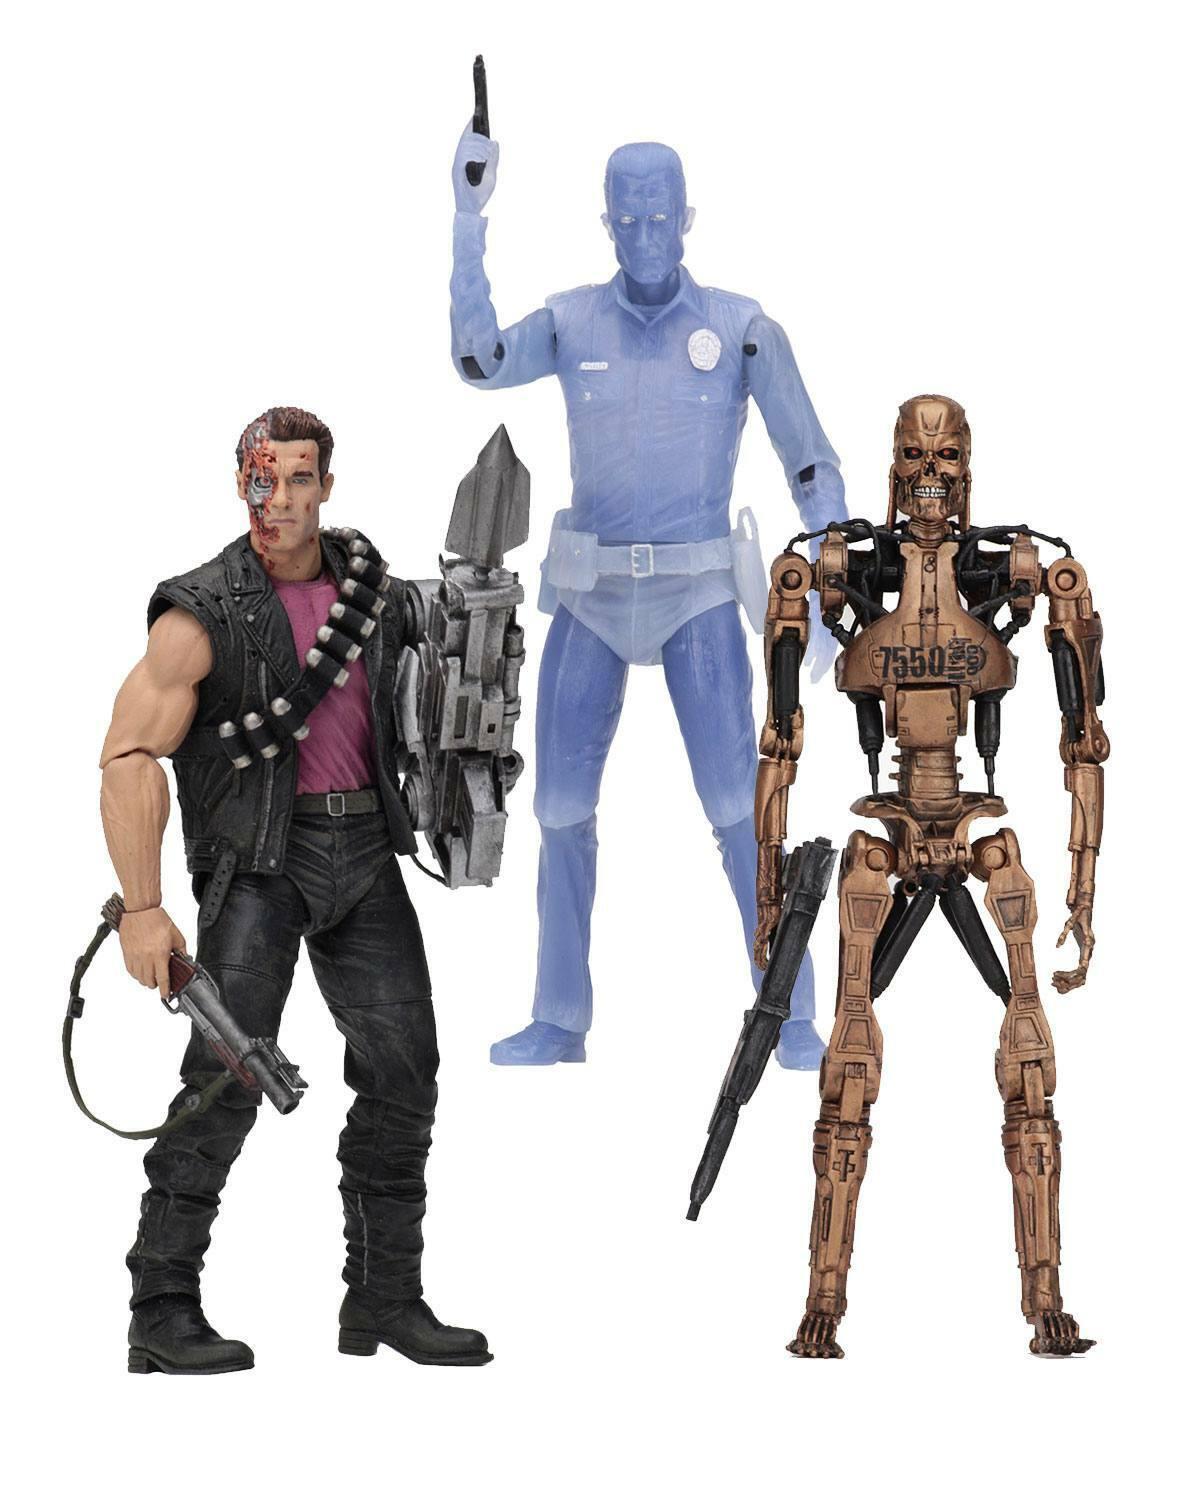 Terminator 2 Actionfigur Set  Connoisseur Tribute  t-1000 endoskeleton neca